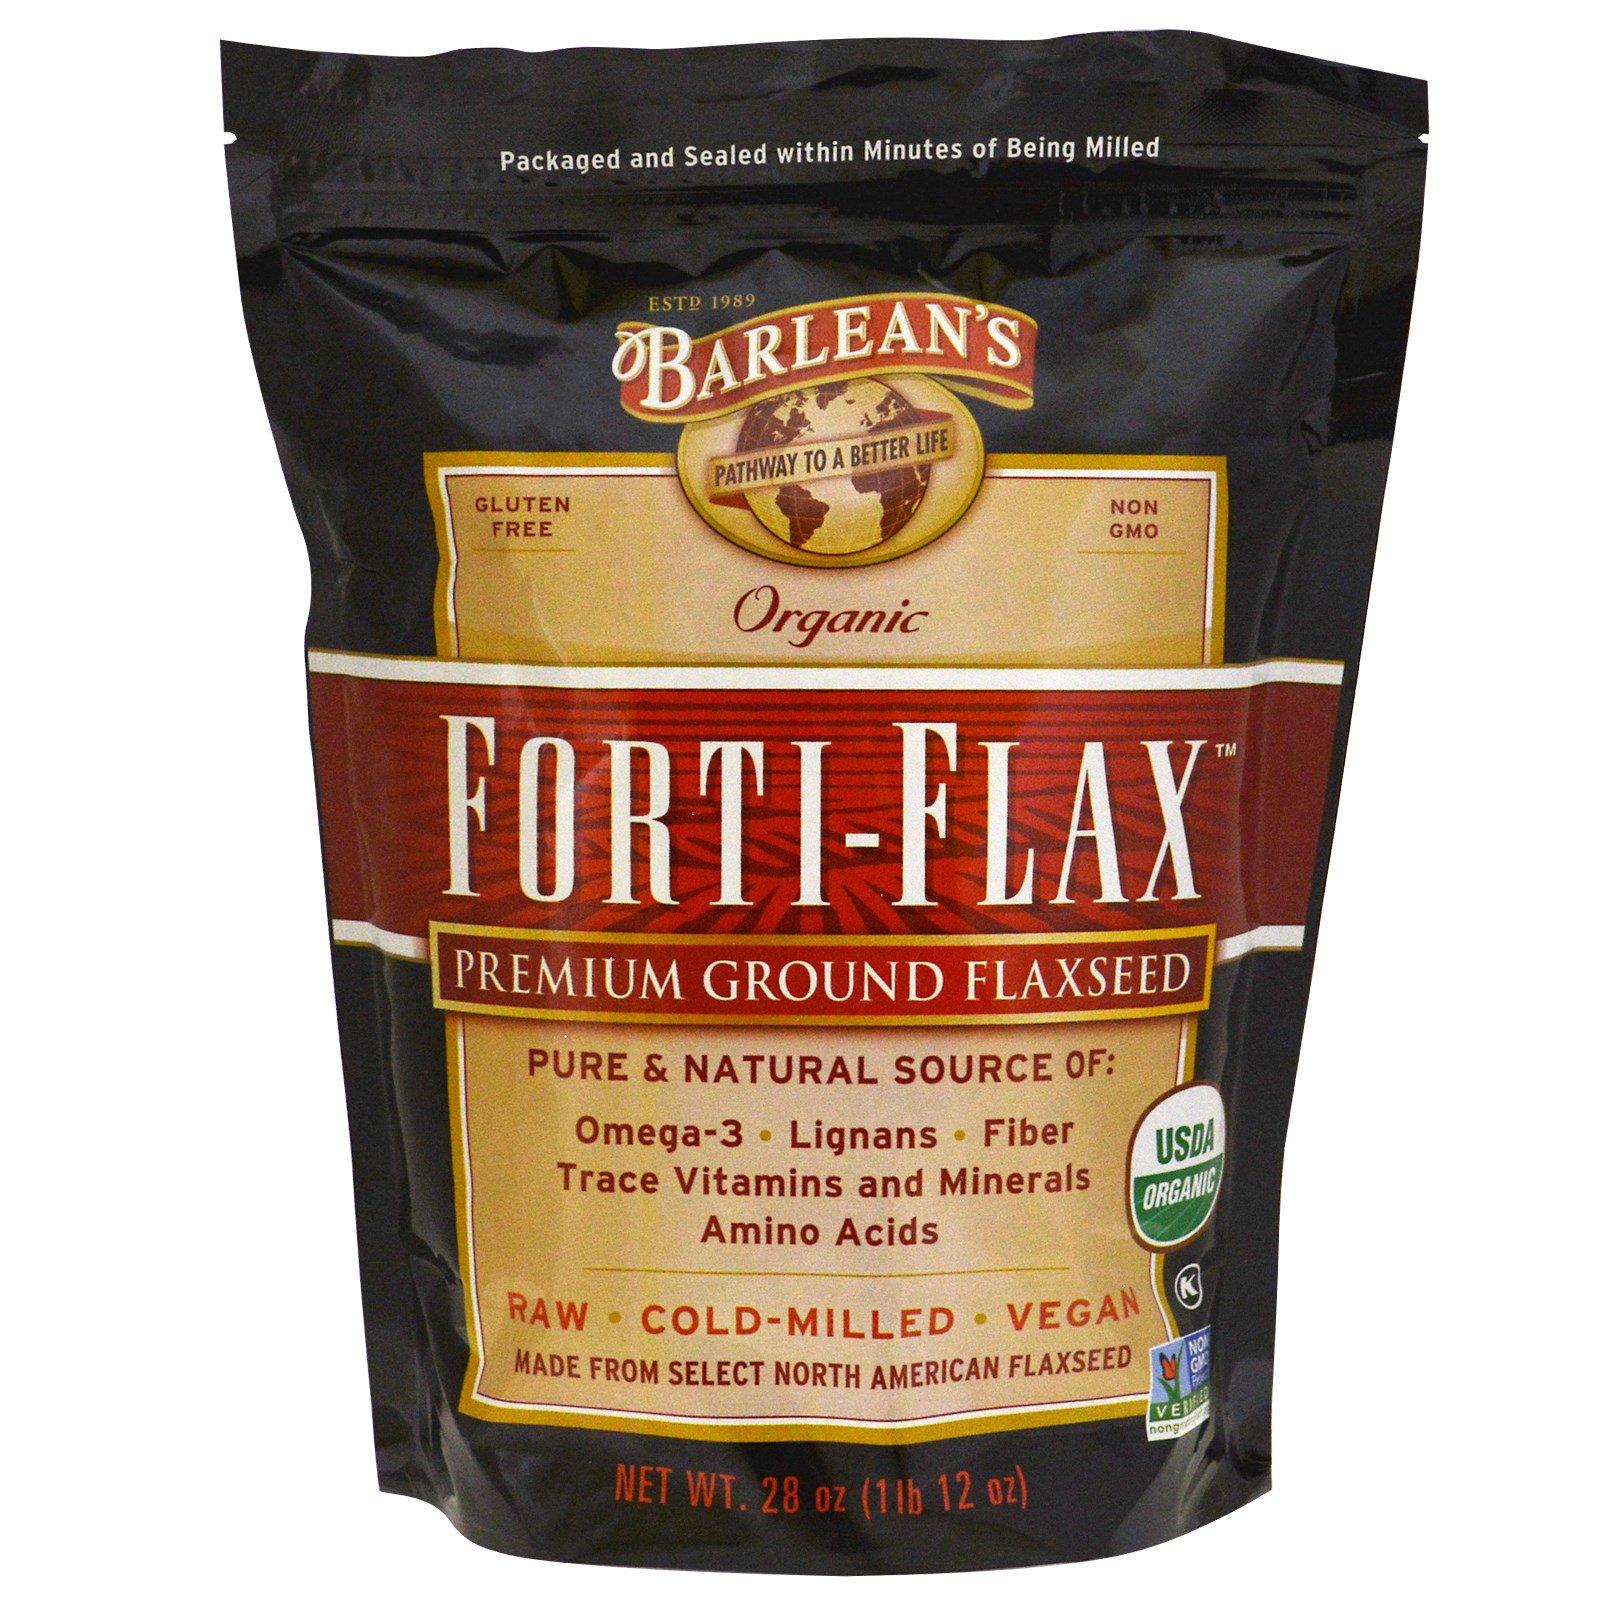 Barlean's, Органический продукт, Forti-Flax, семя льна лучшего помола, 28 унций (1 фунт 12 унций)